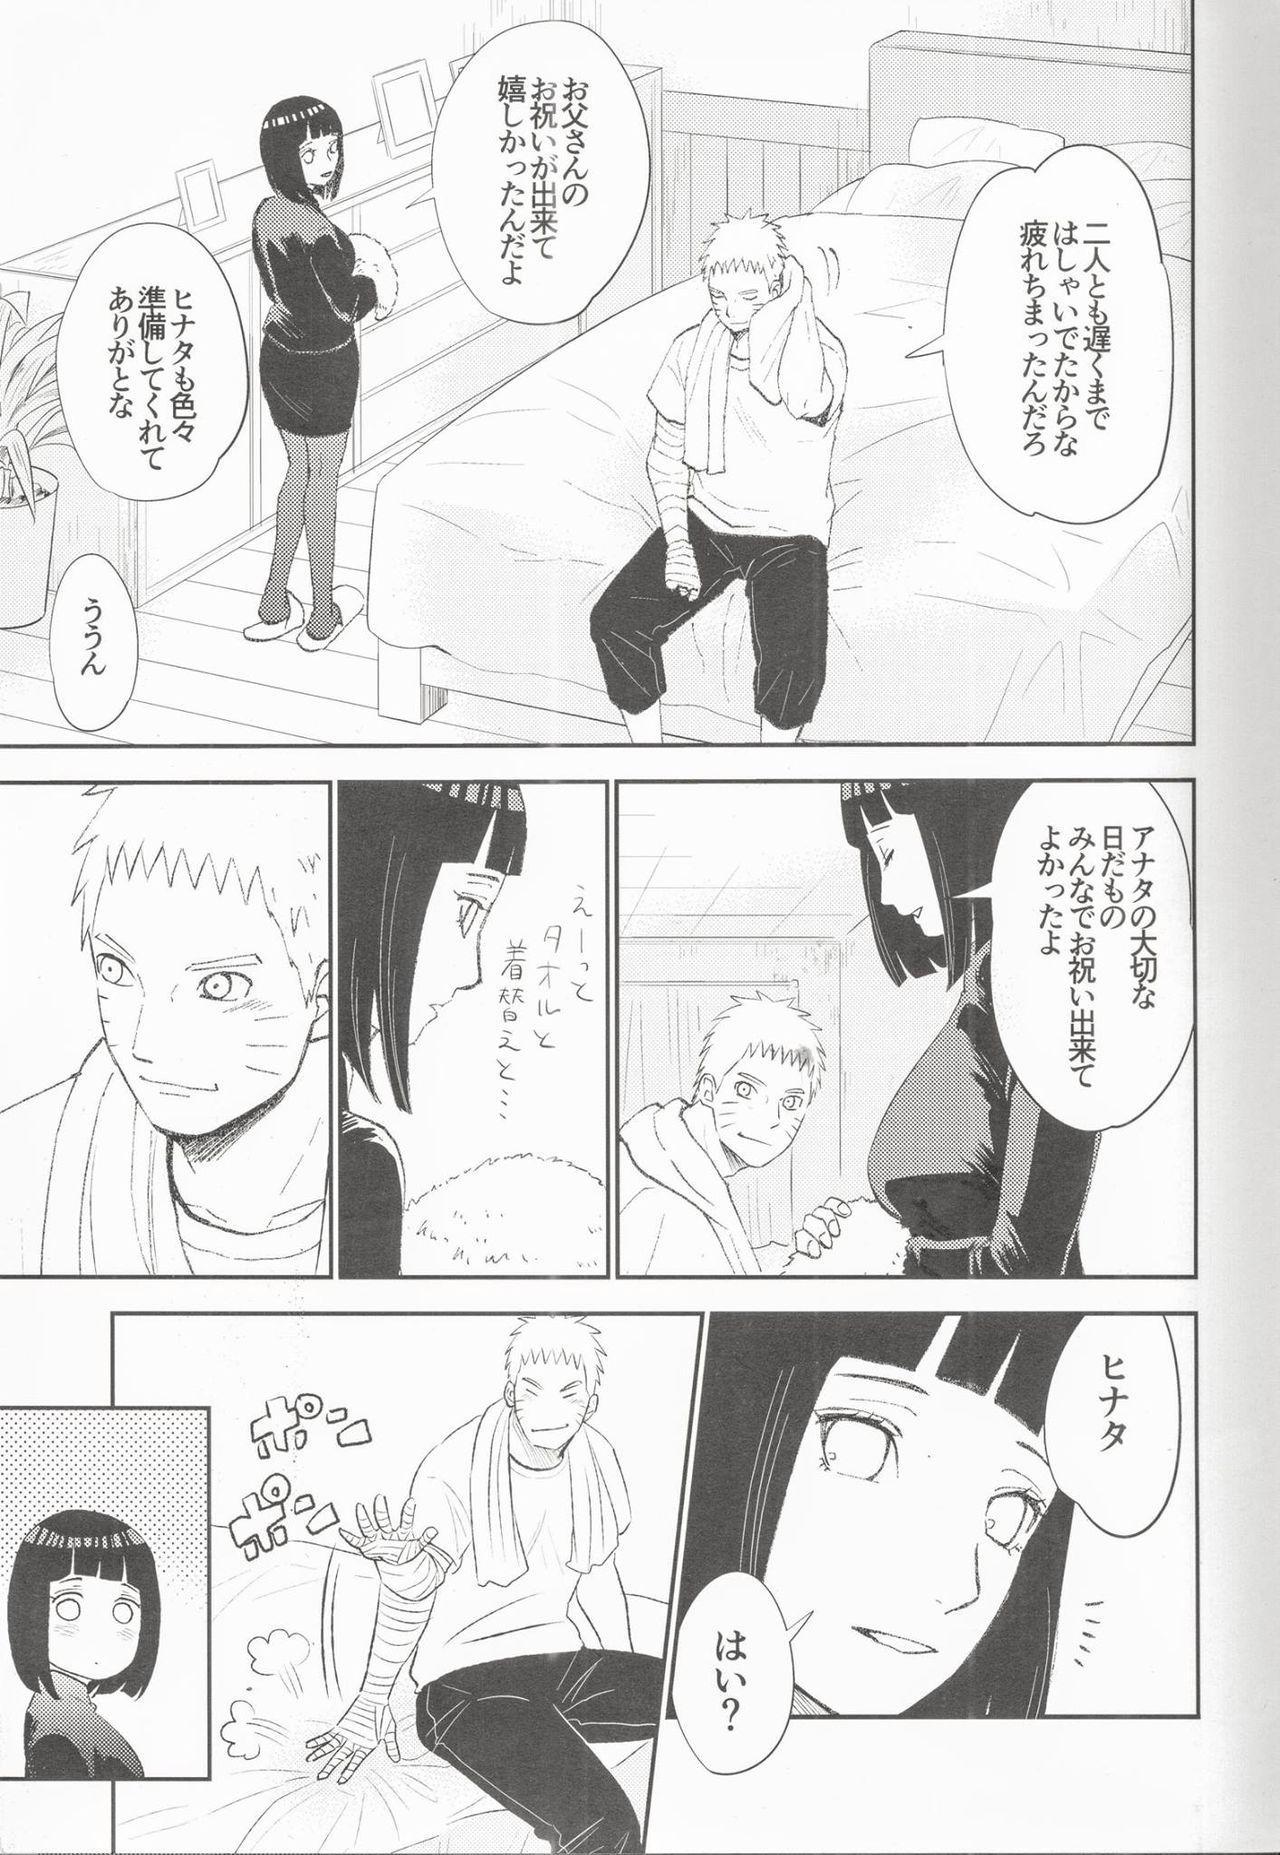 Fuufu no Jikan 5